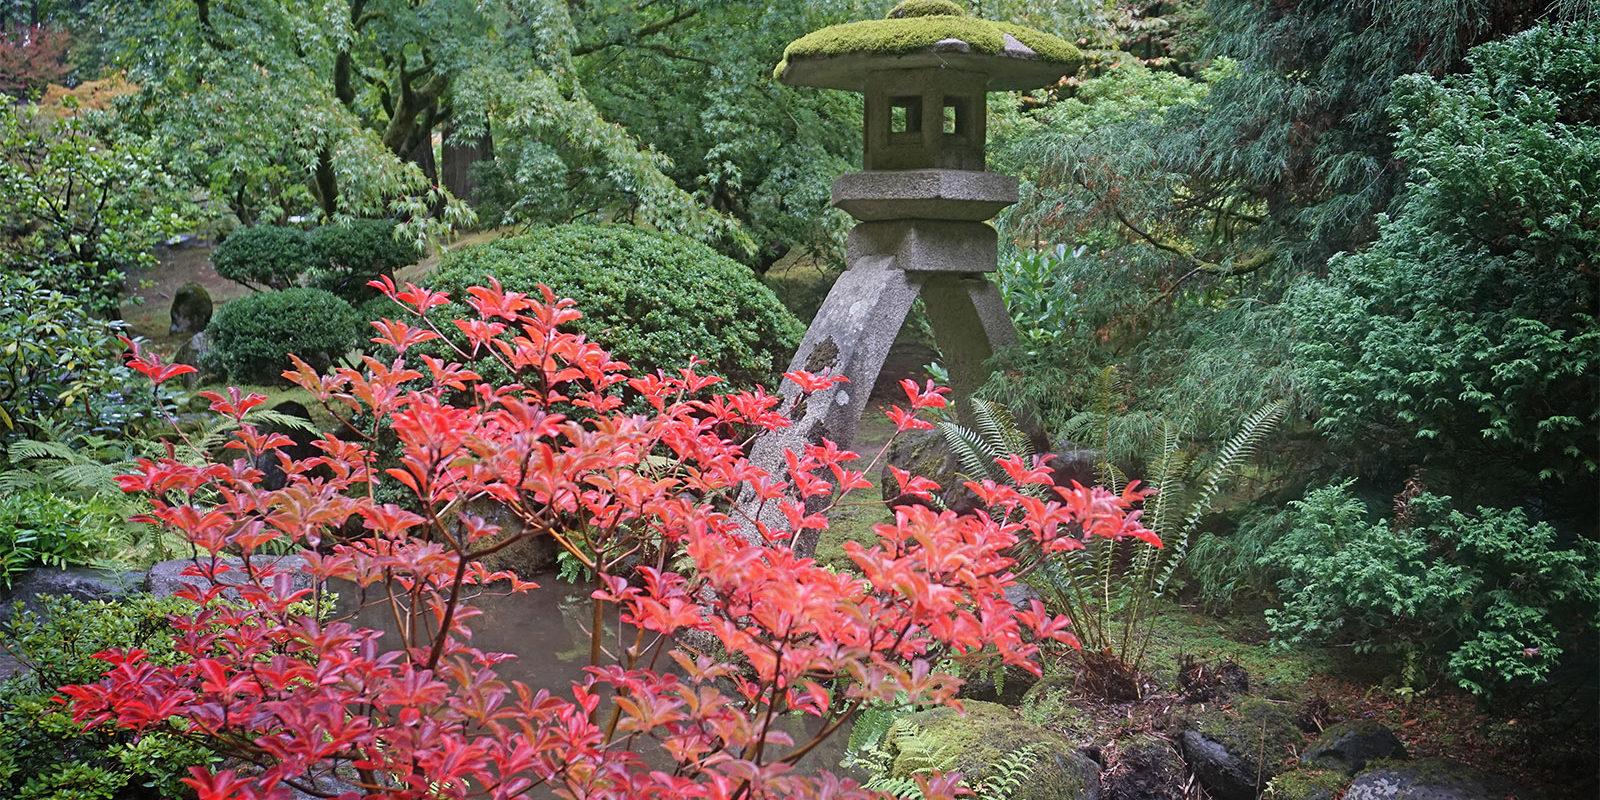 Portland Japanese Garden Early Fall Colors by Tyler Quinn - 2018-10-09 - DSC00920_low